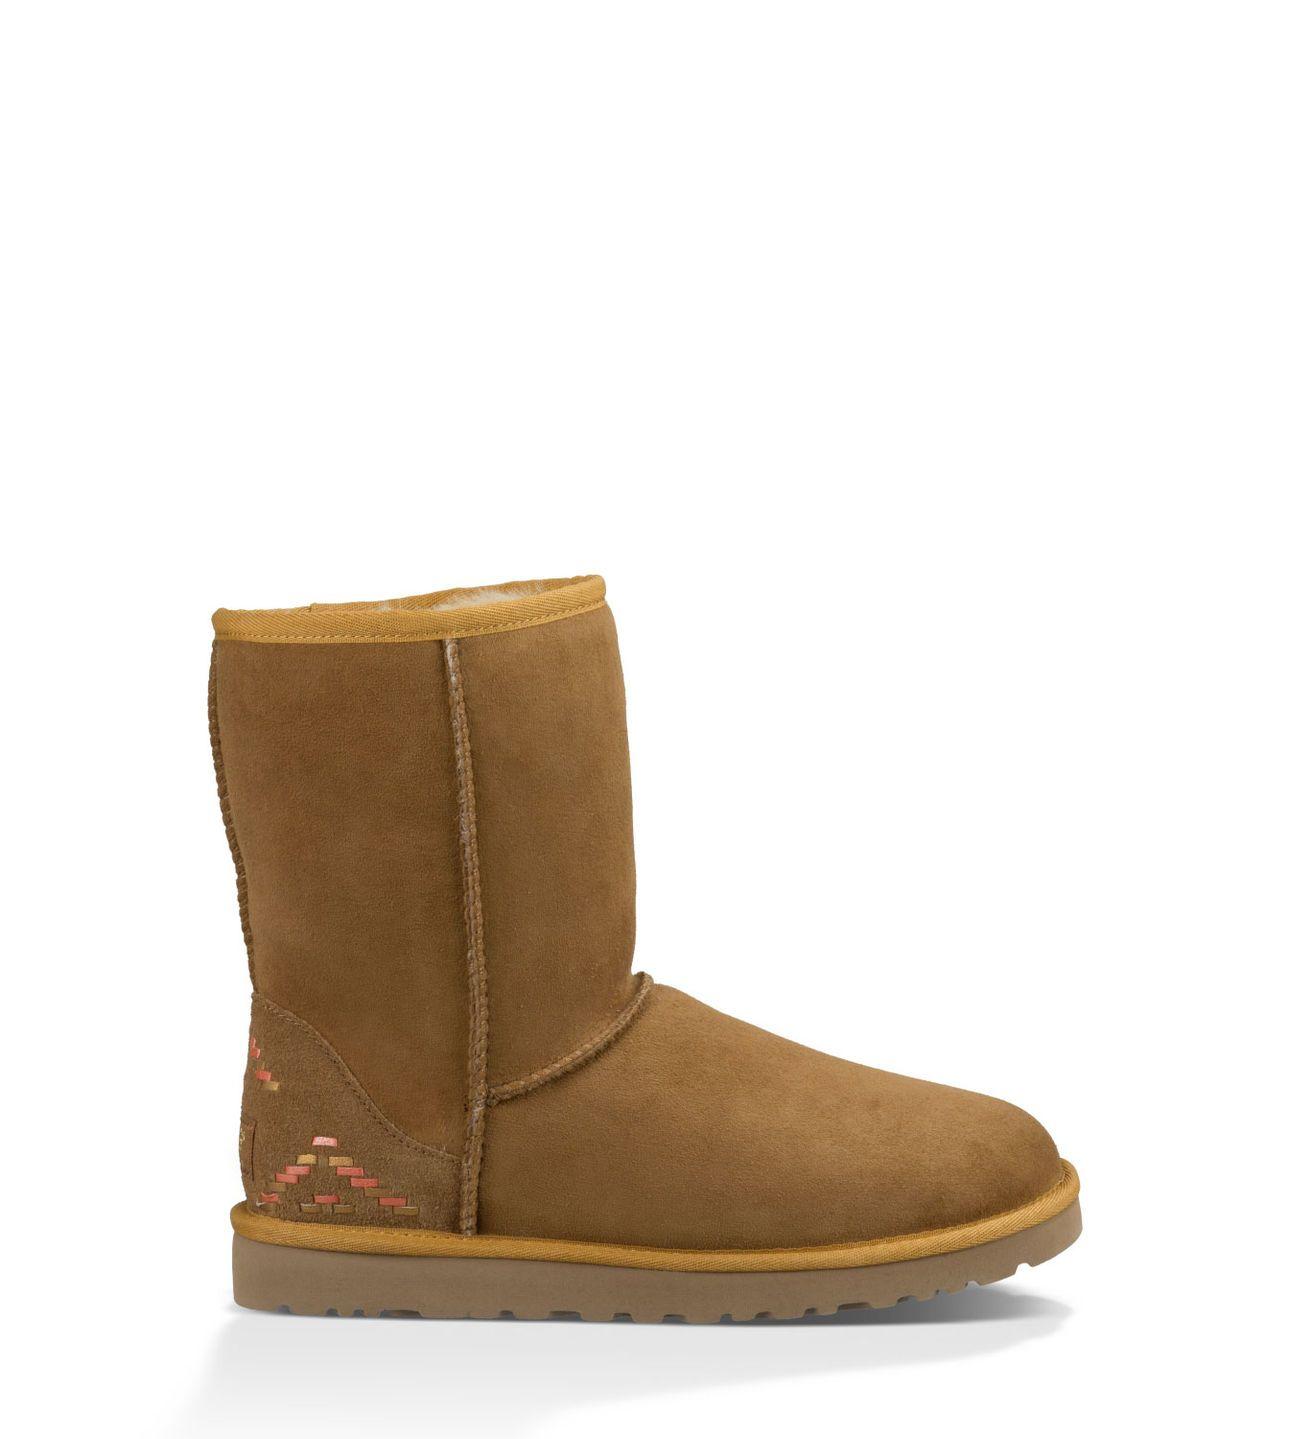 28e84672f99 UGG Official | Women's Classic Short Rustic Weave Footwear ...